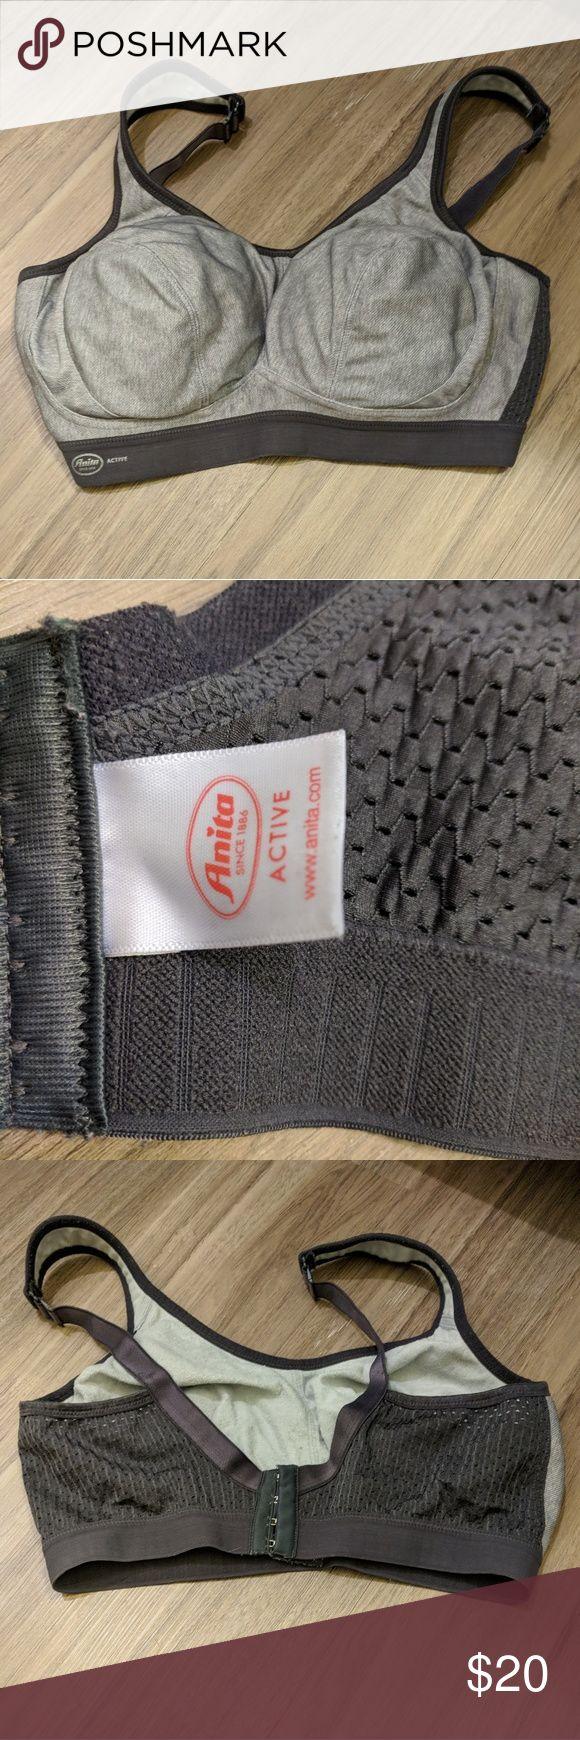 Anita Active Sports Bra Anita Active Sports Bra. Adjustable straps. Size 40 D. Anita Intimates & Sleepwear Bras